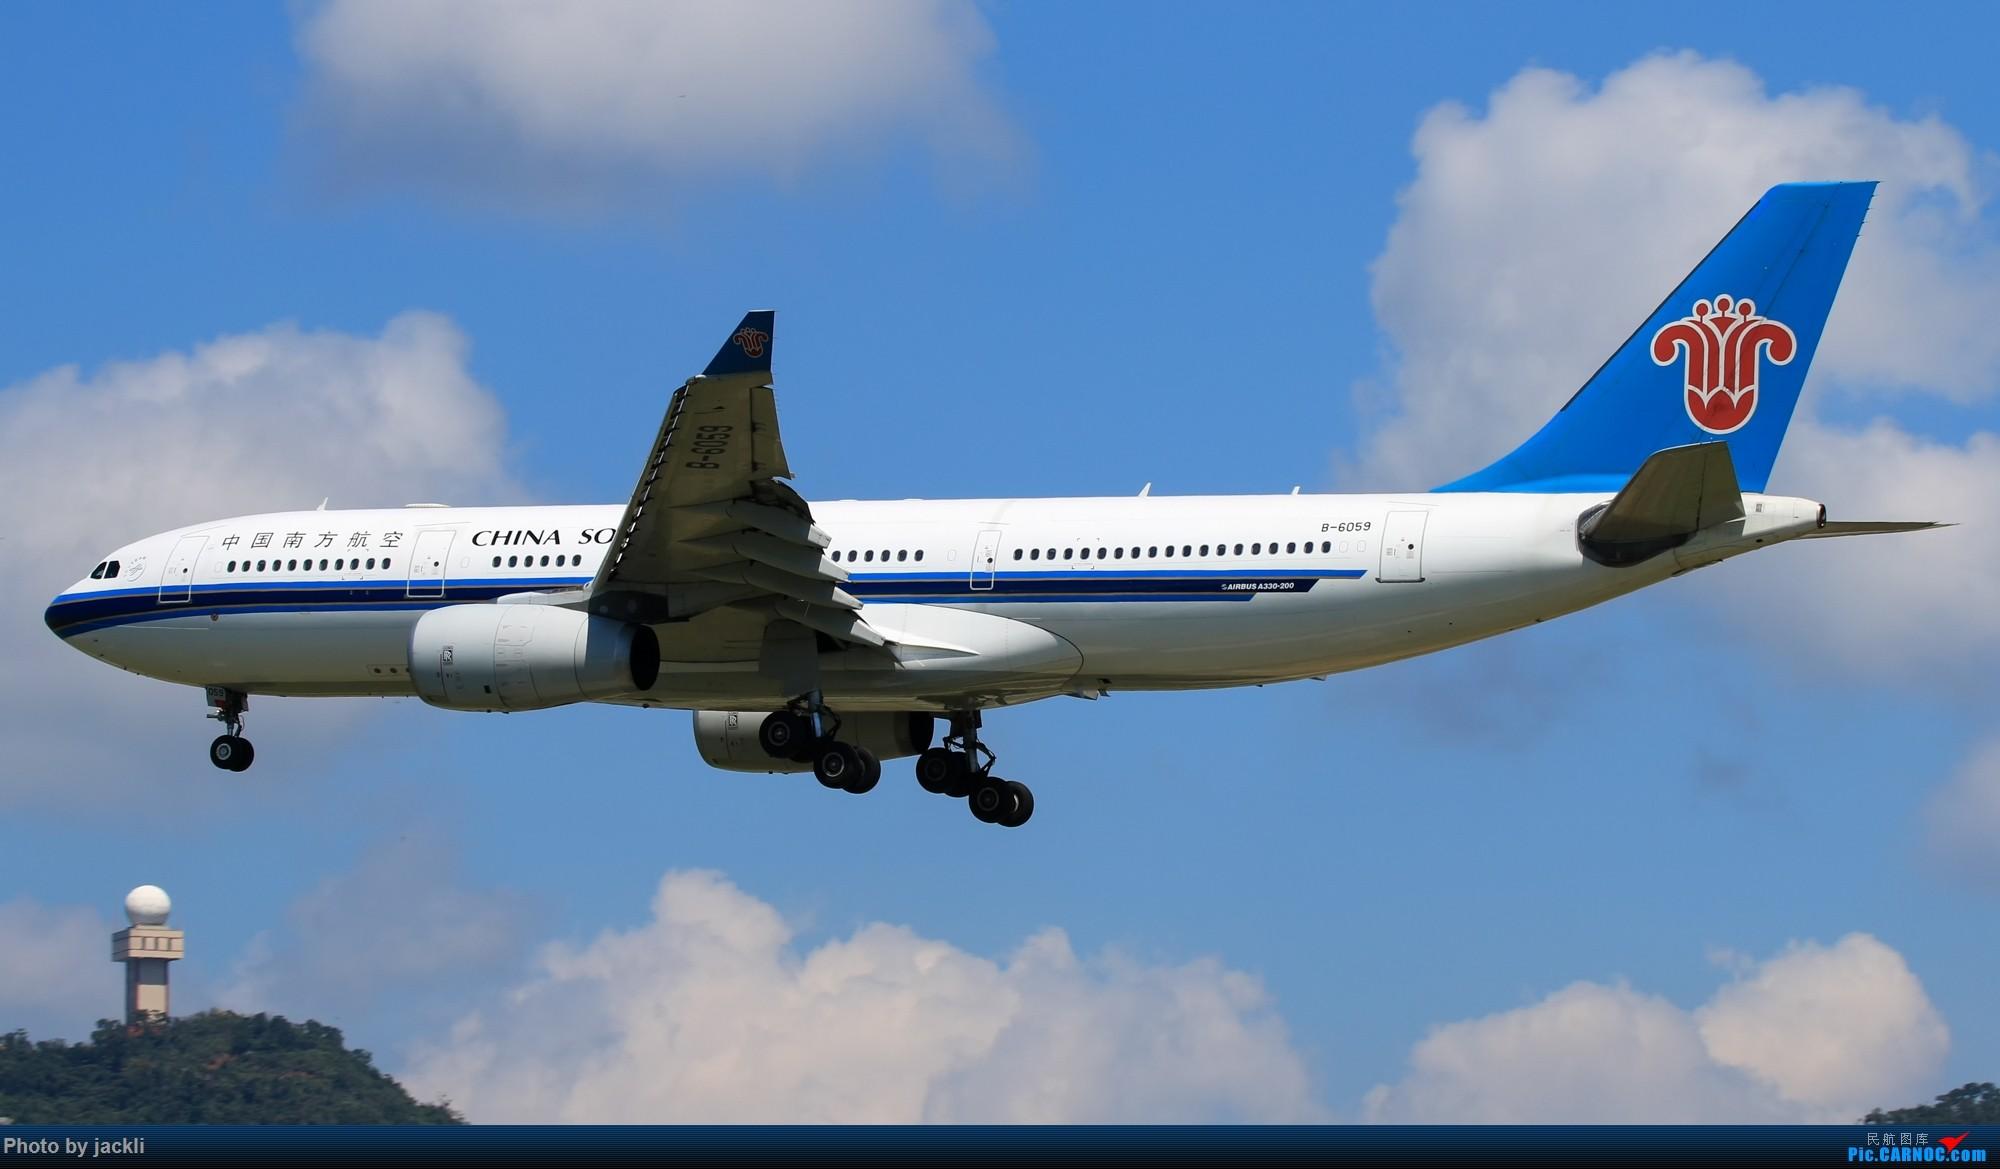 Re:[原创]【JackLi】航展之外的繁忙--近期珠海机场拍机~ AIRBUS A330-200 B-6059 中国珠海金湾机场